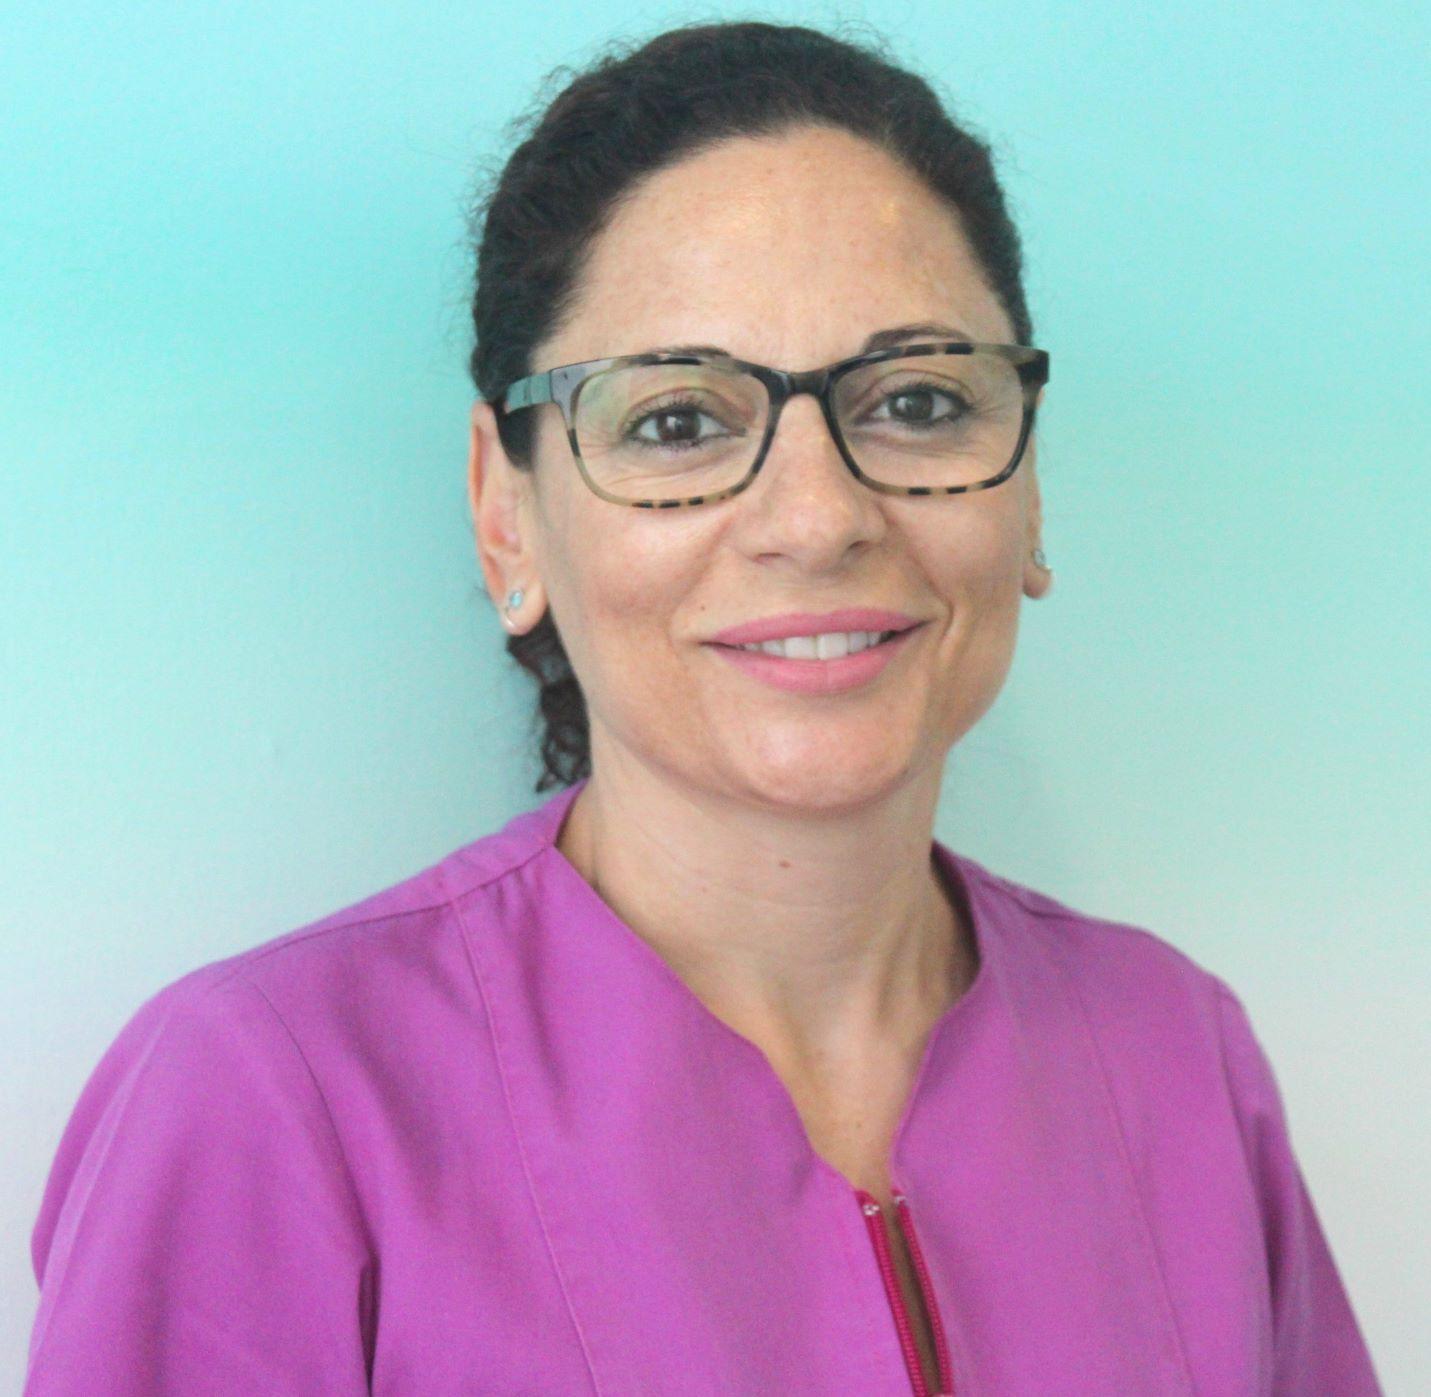 http://www.clinicagarciamonleon.com/wp-contingut/uploads/2019/03/Foto-de-Sofia-2.jpg